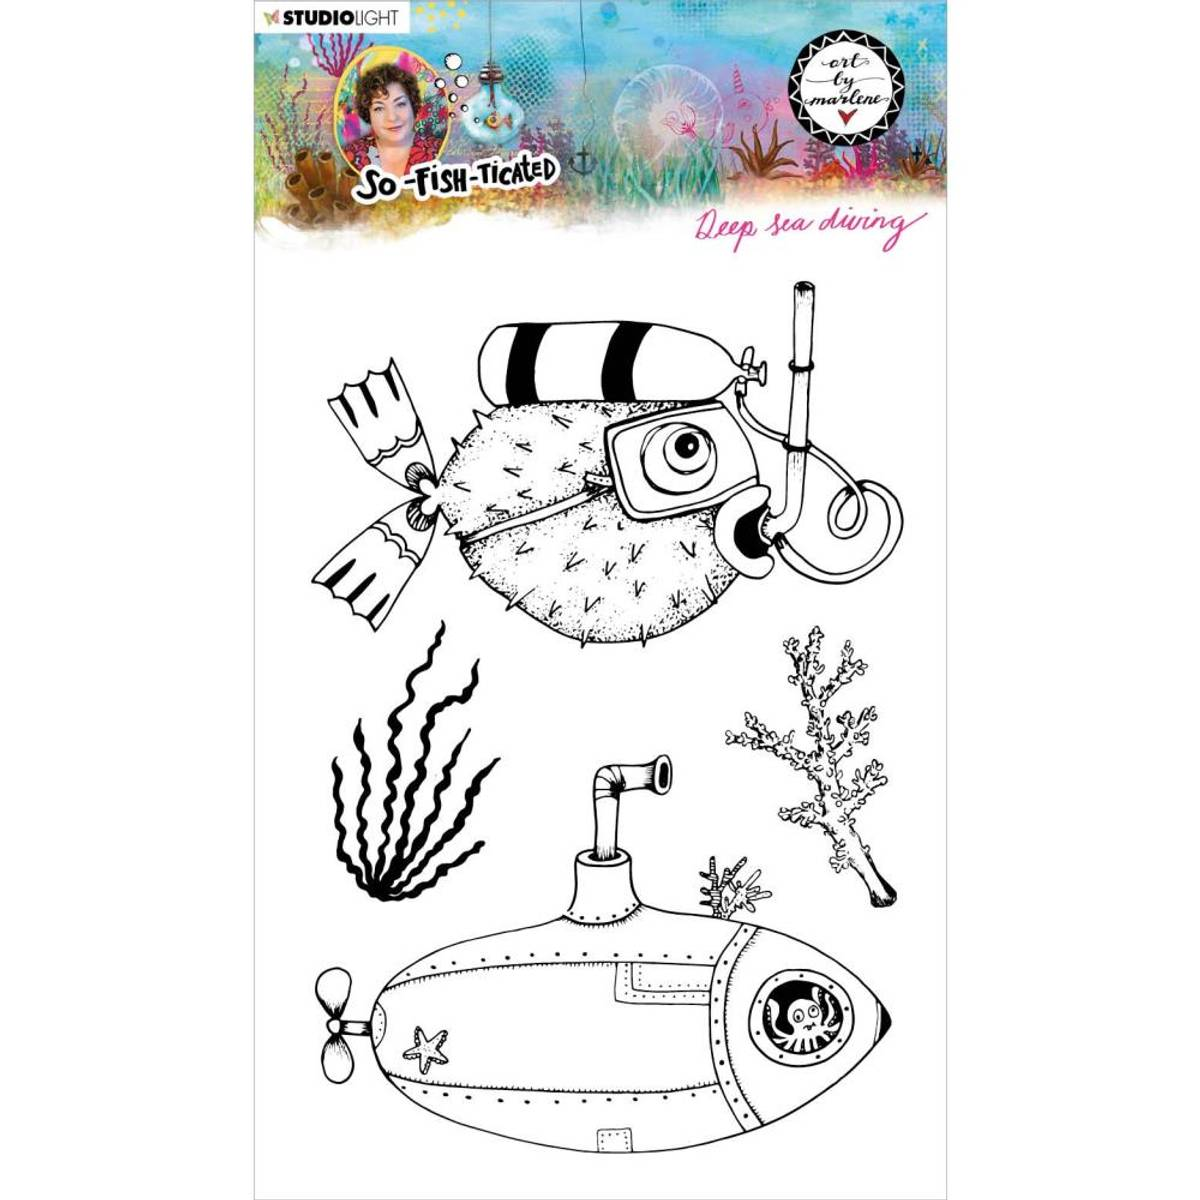 Art By Marlene So-Fish-Ticated Deep Sea Diving